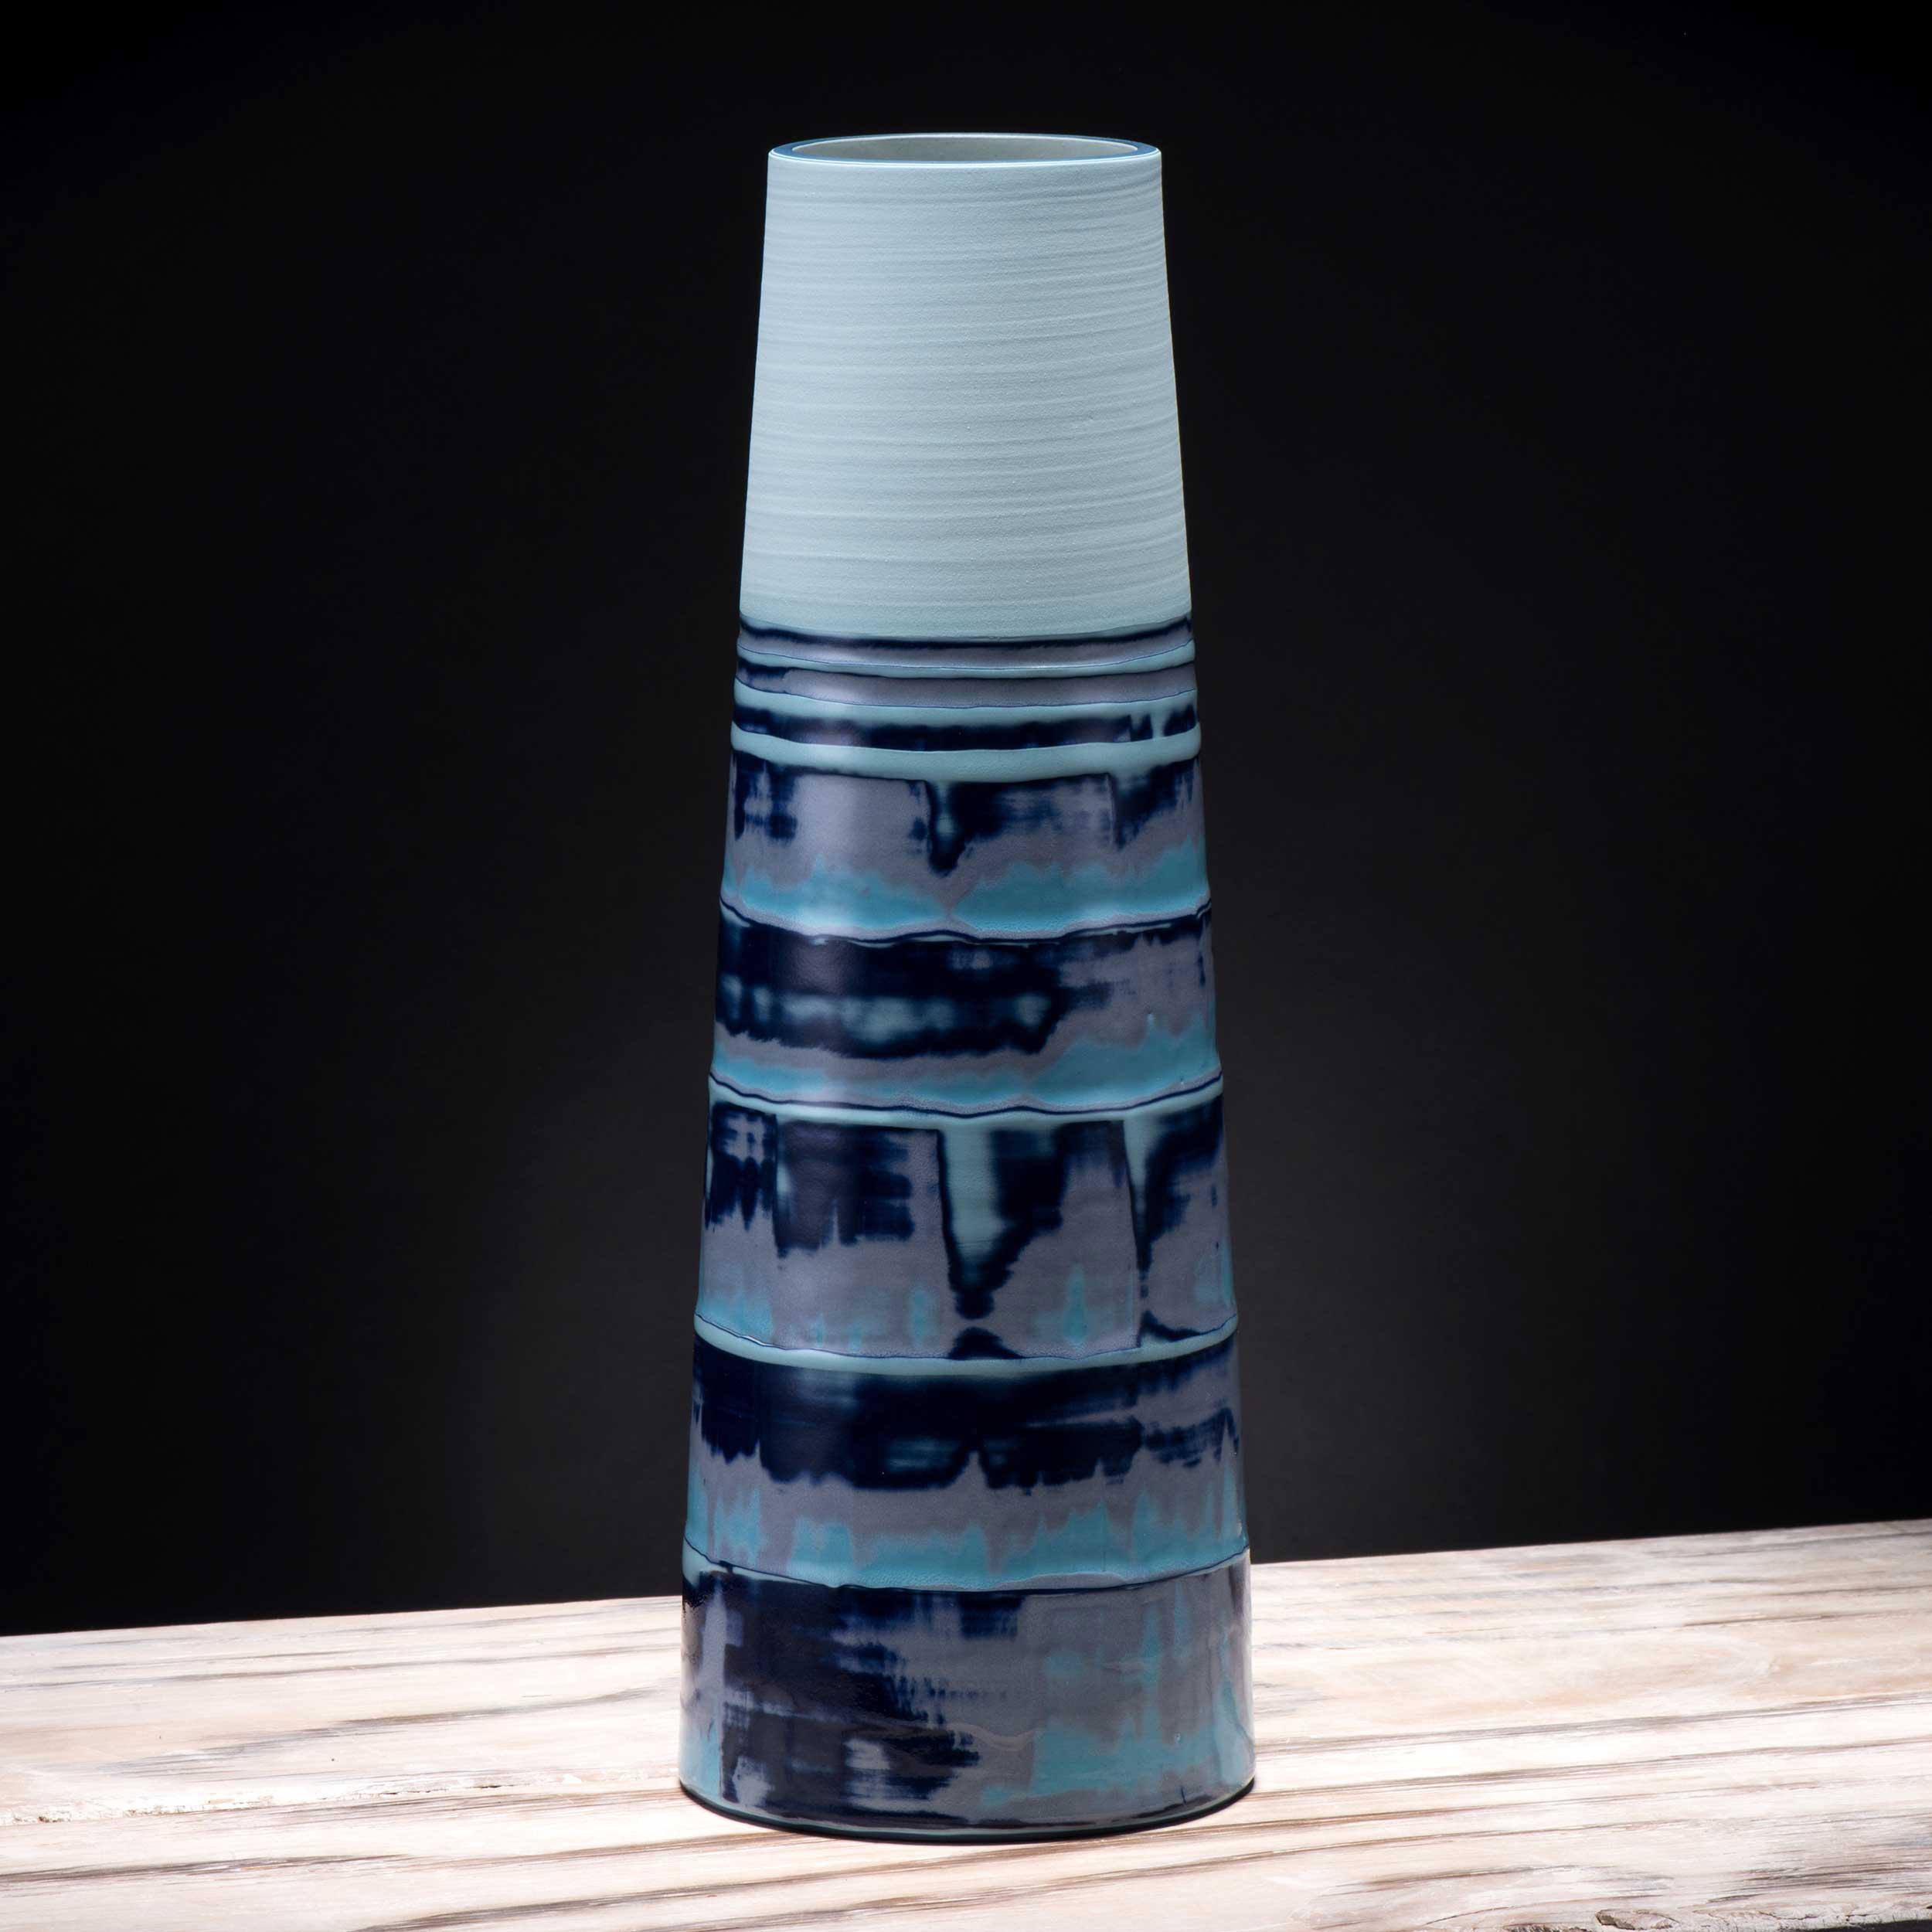 Copy of Turquoise Blue Sea Wave Ceramic Stem Vase by Rowena Gilbert